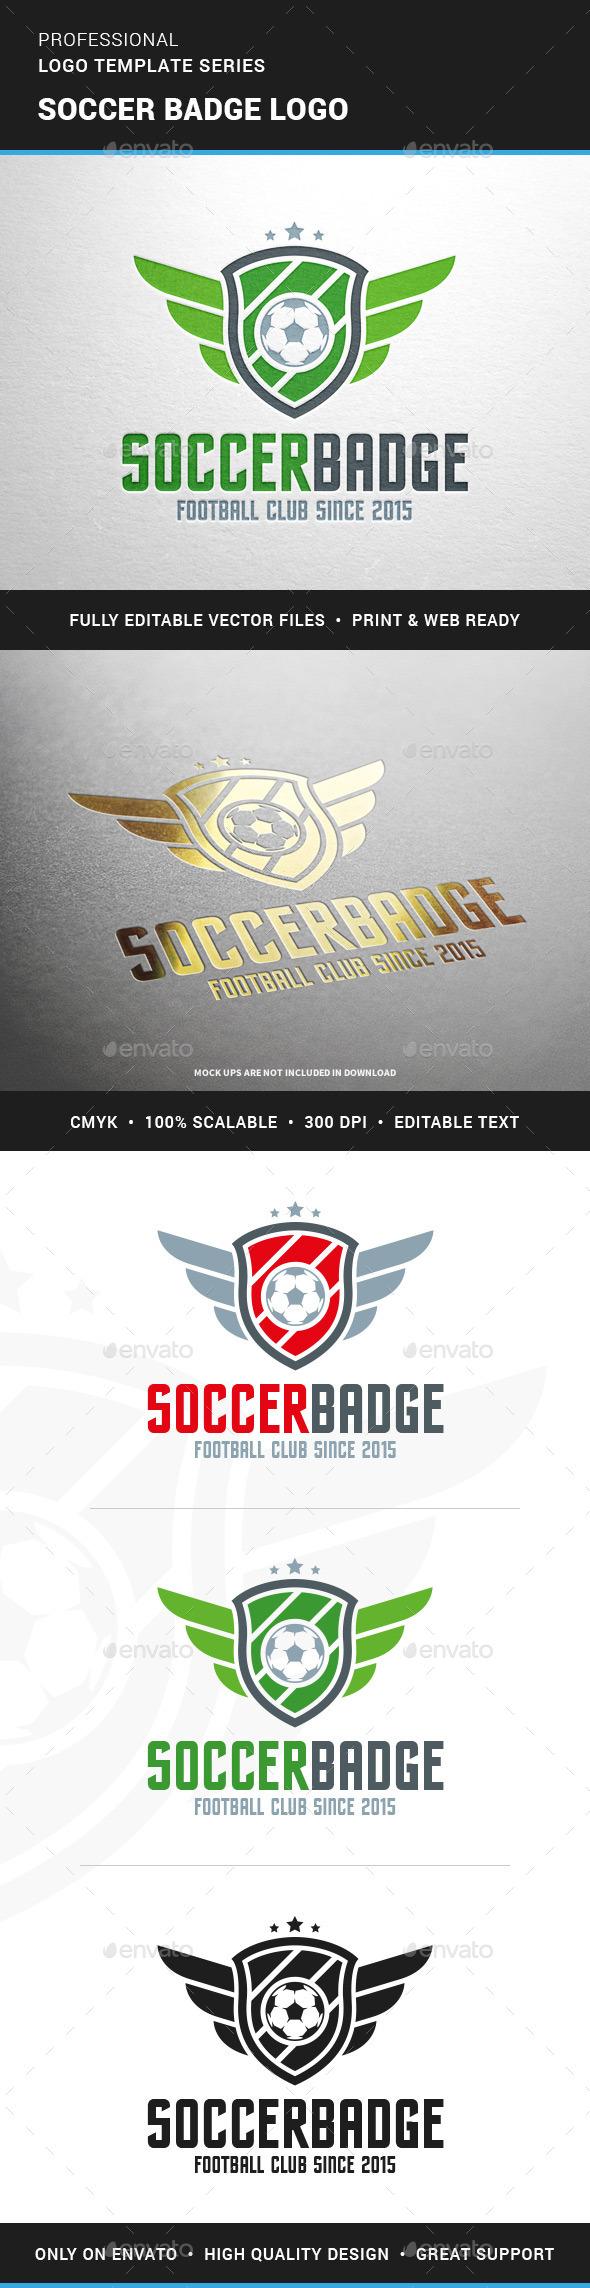 Soccer Badge Logo Template - Crests Logo Templates